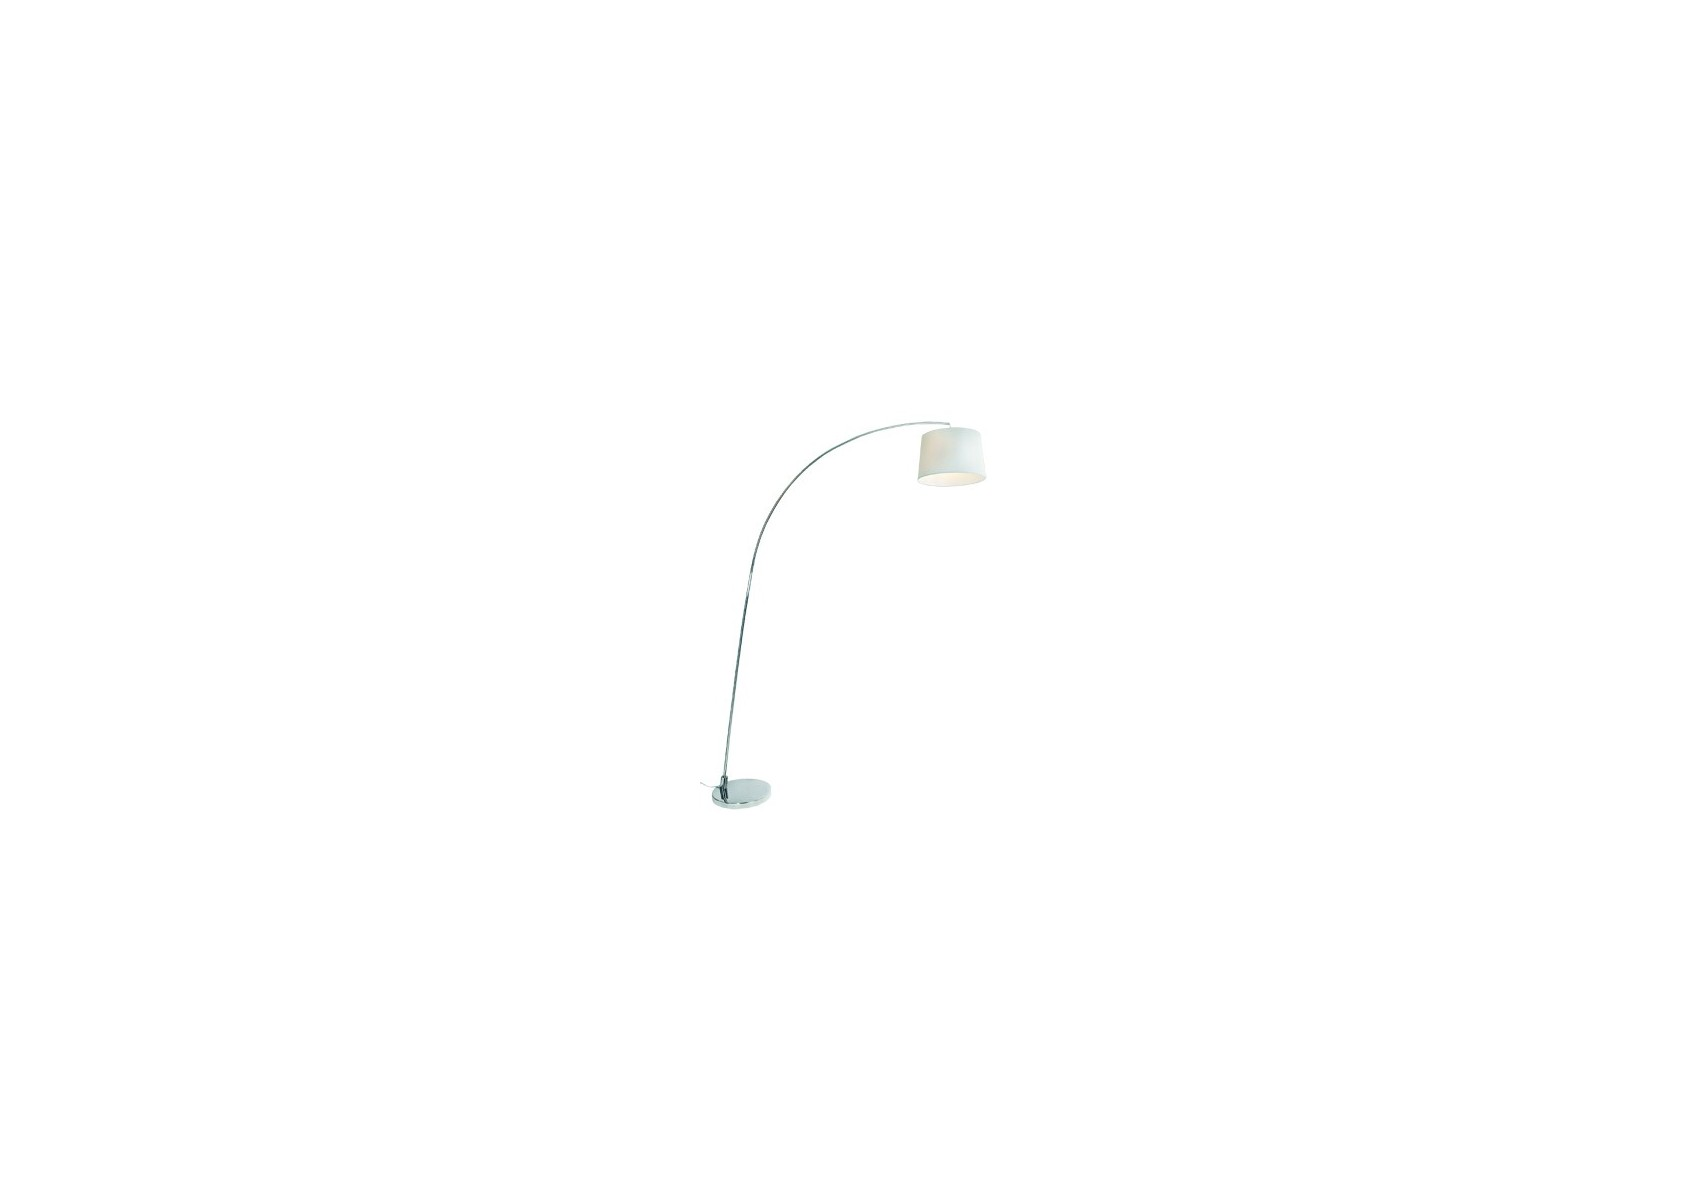 lampadaire design arc ls de chez aluminor avec abat jour blanc. Black Bedroom Furniture Sets. Home Design Ideas